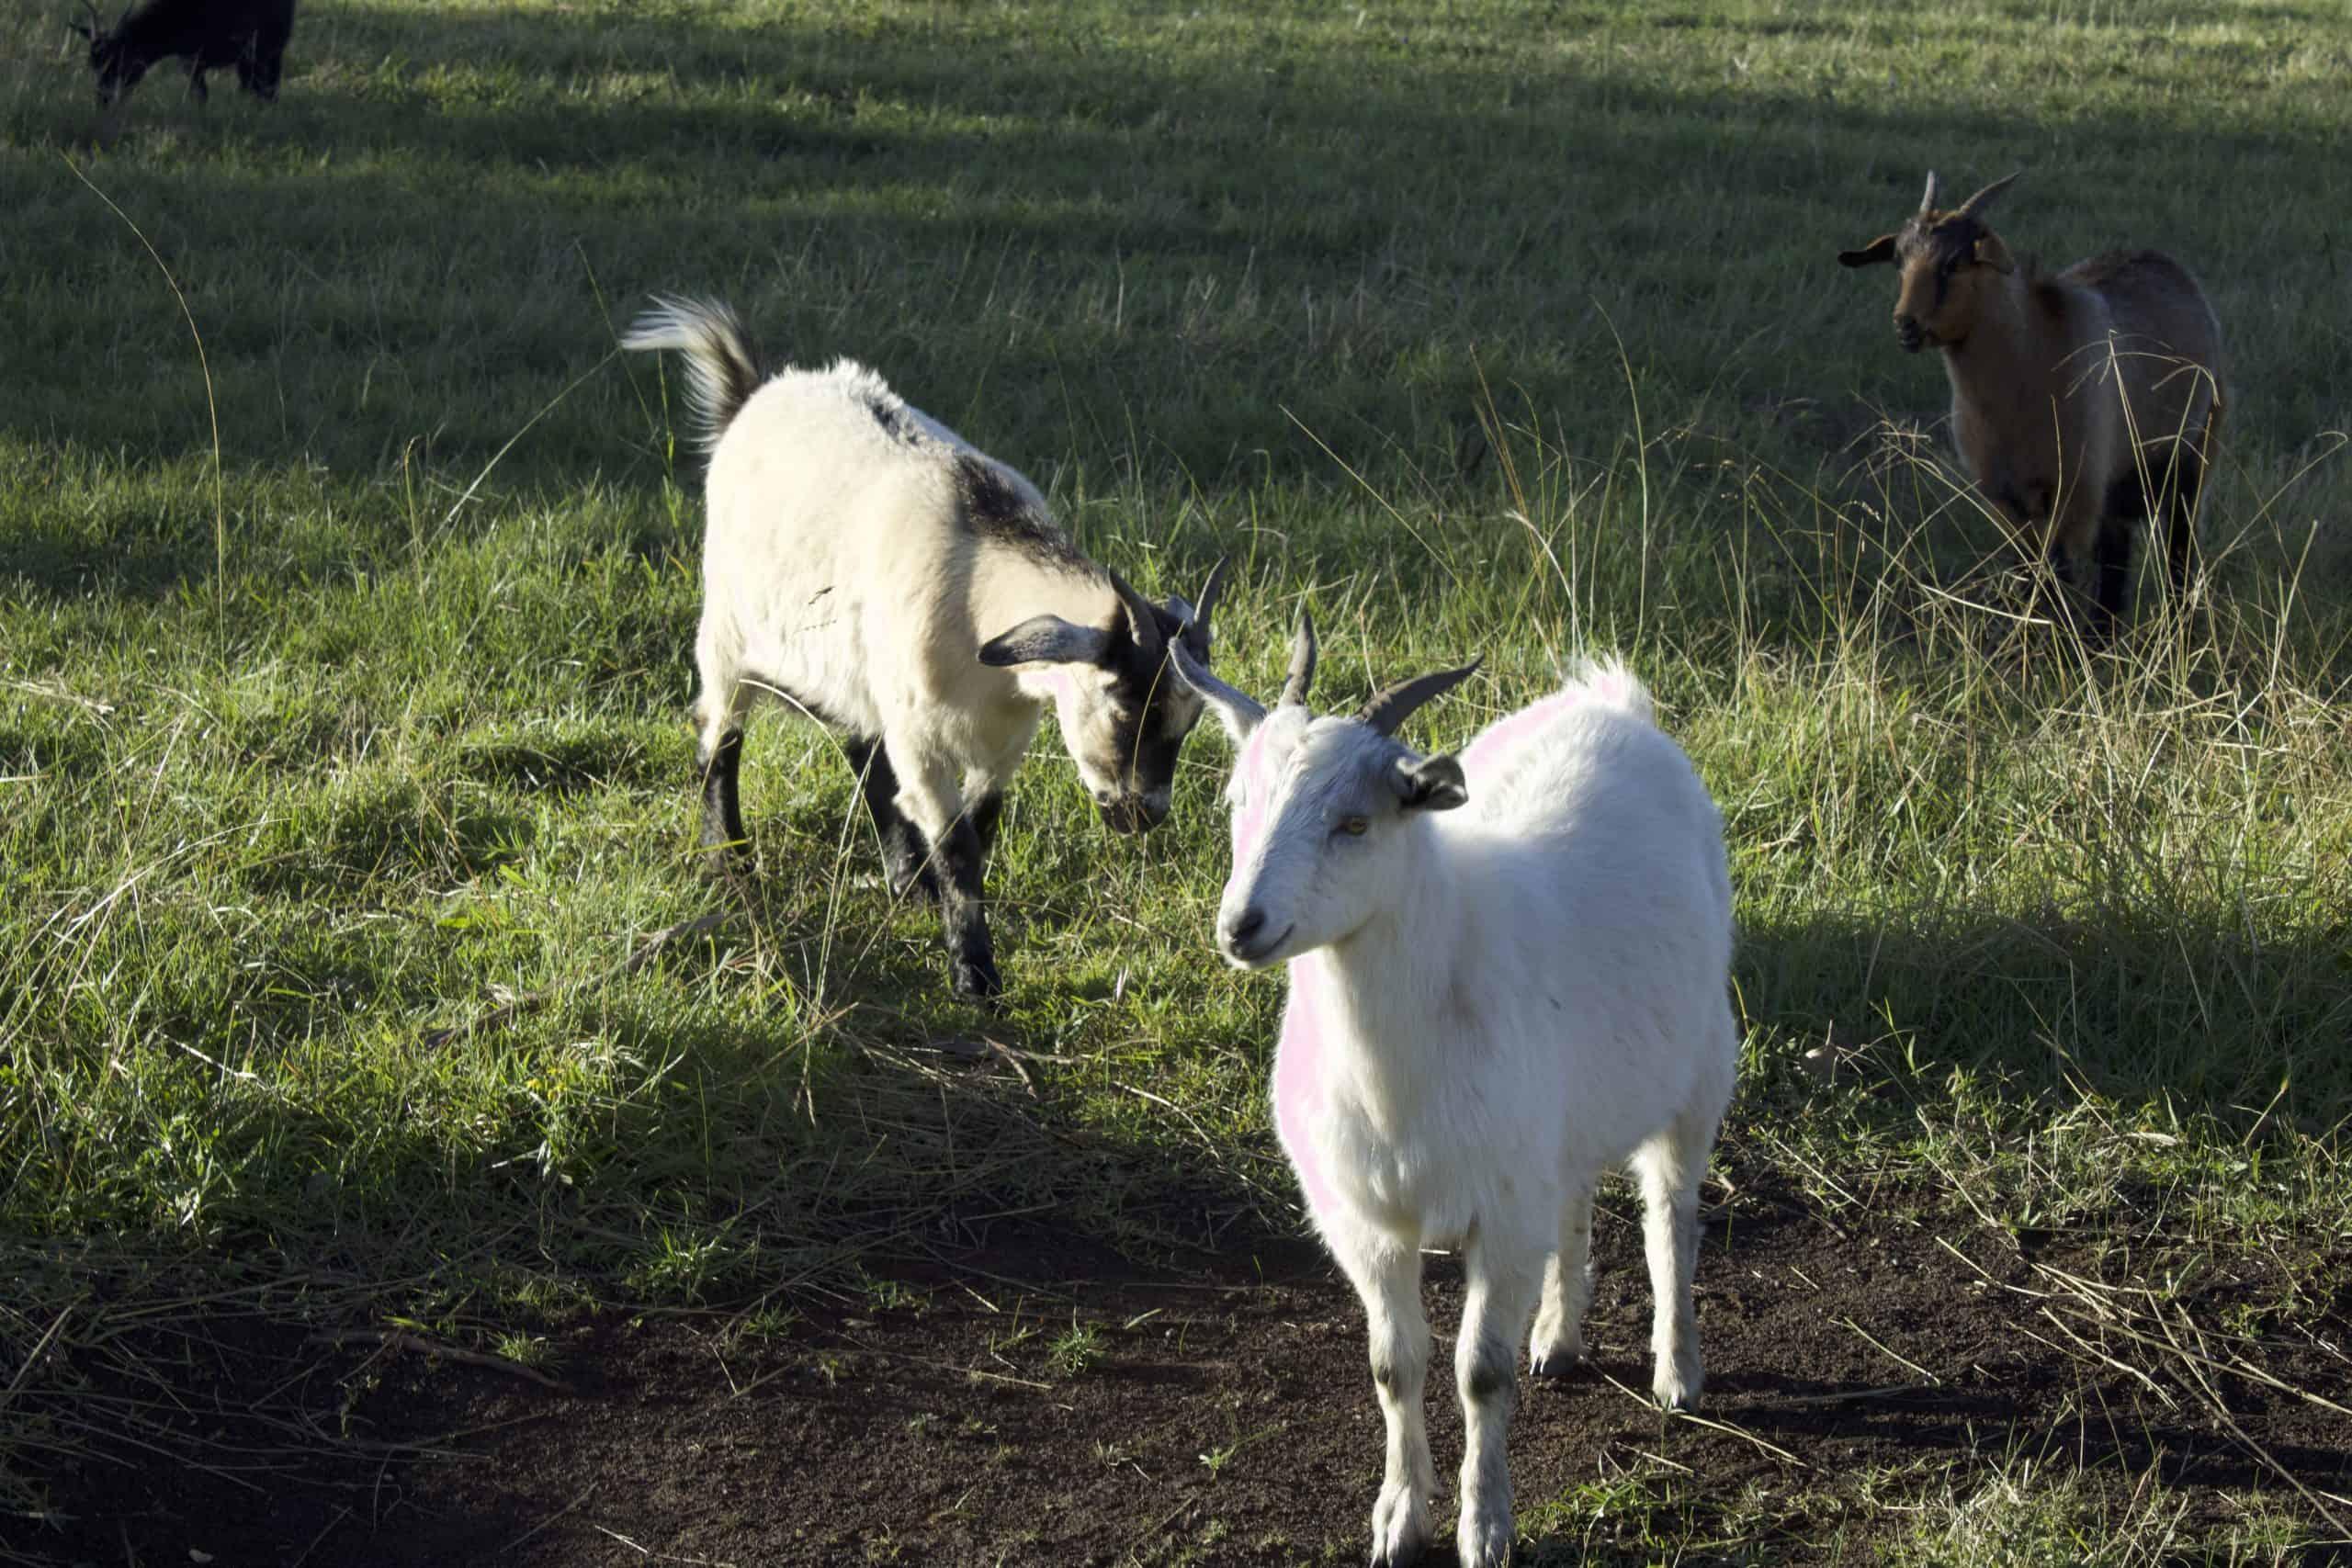 Goat Meat Farm - white marked goat